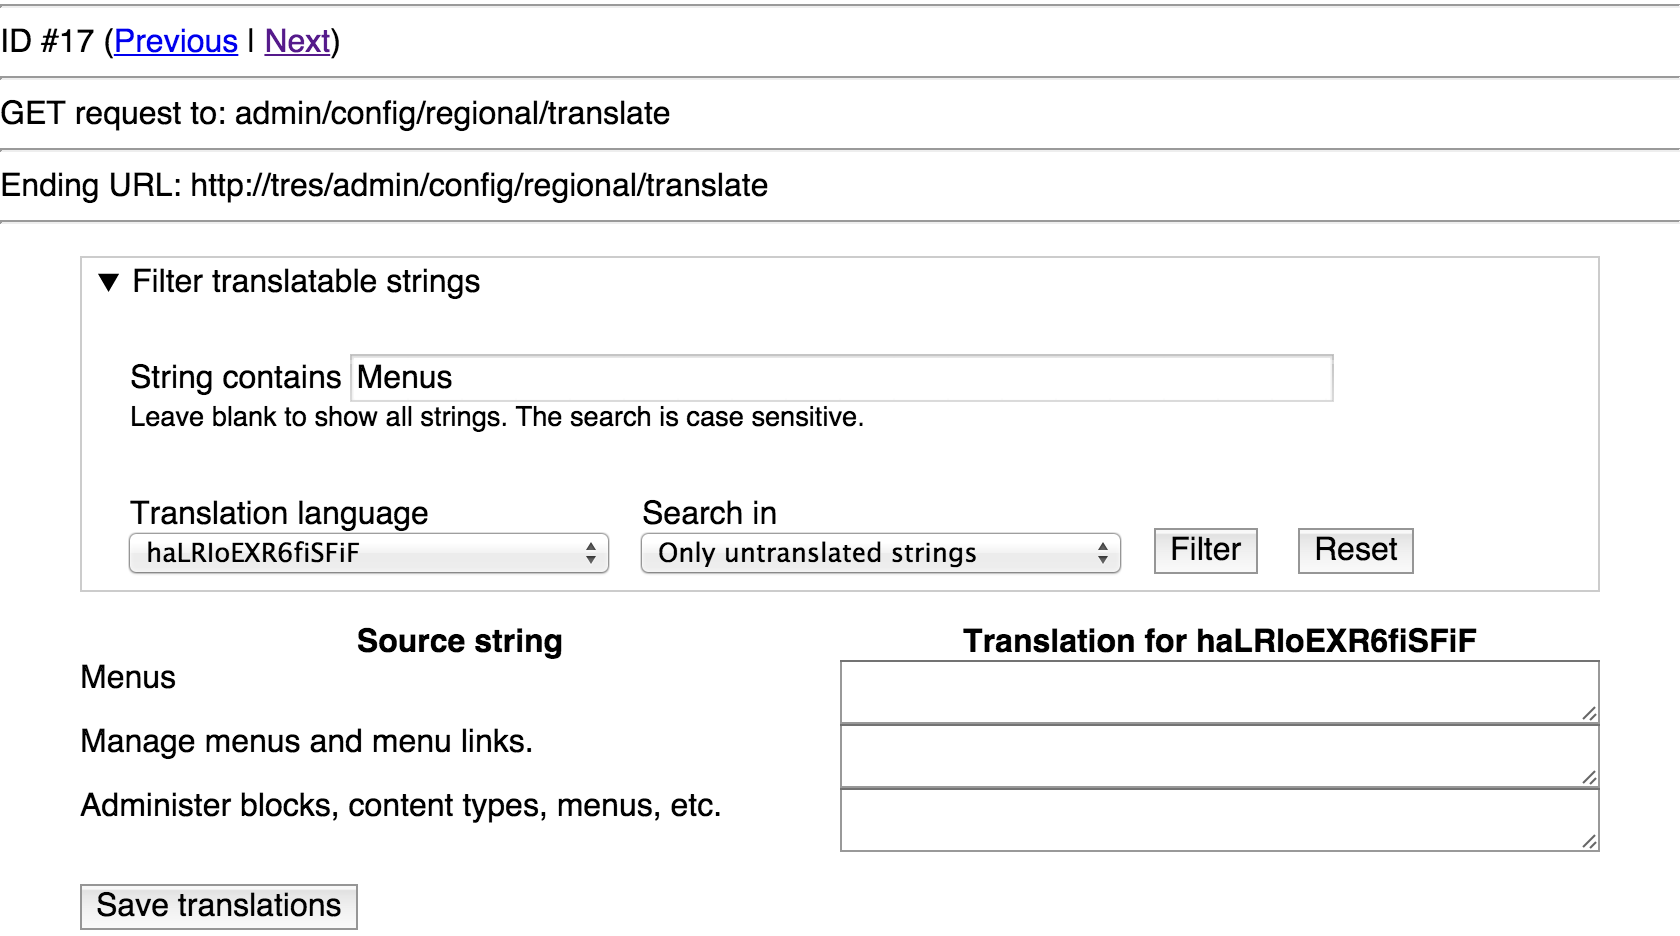 Locale DB schema case insensitive (blob) only on MySQL not